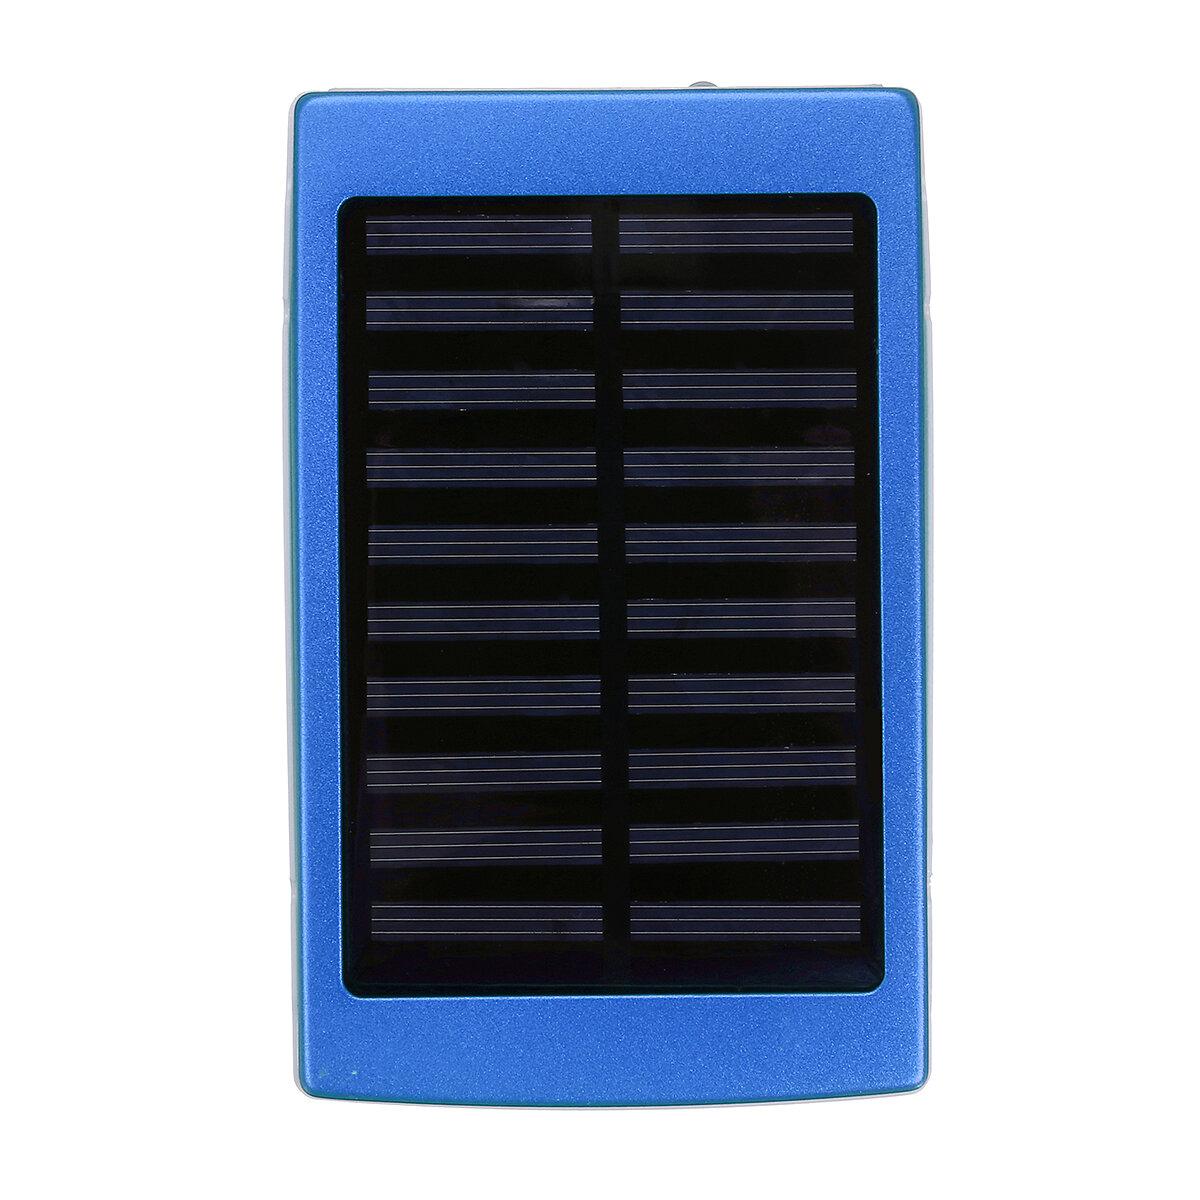 Solar Charger Case Portable DIY 5x18650 Power Power Bank 20000mAh Solar Power Bank Case Box Dual USB Kit Phone Charger Flashlight